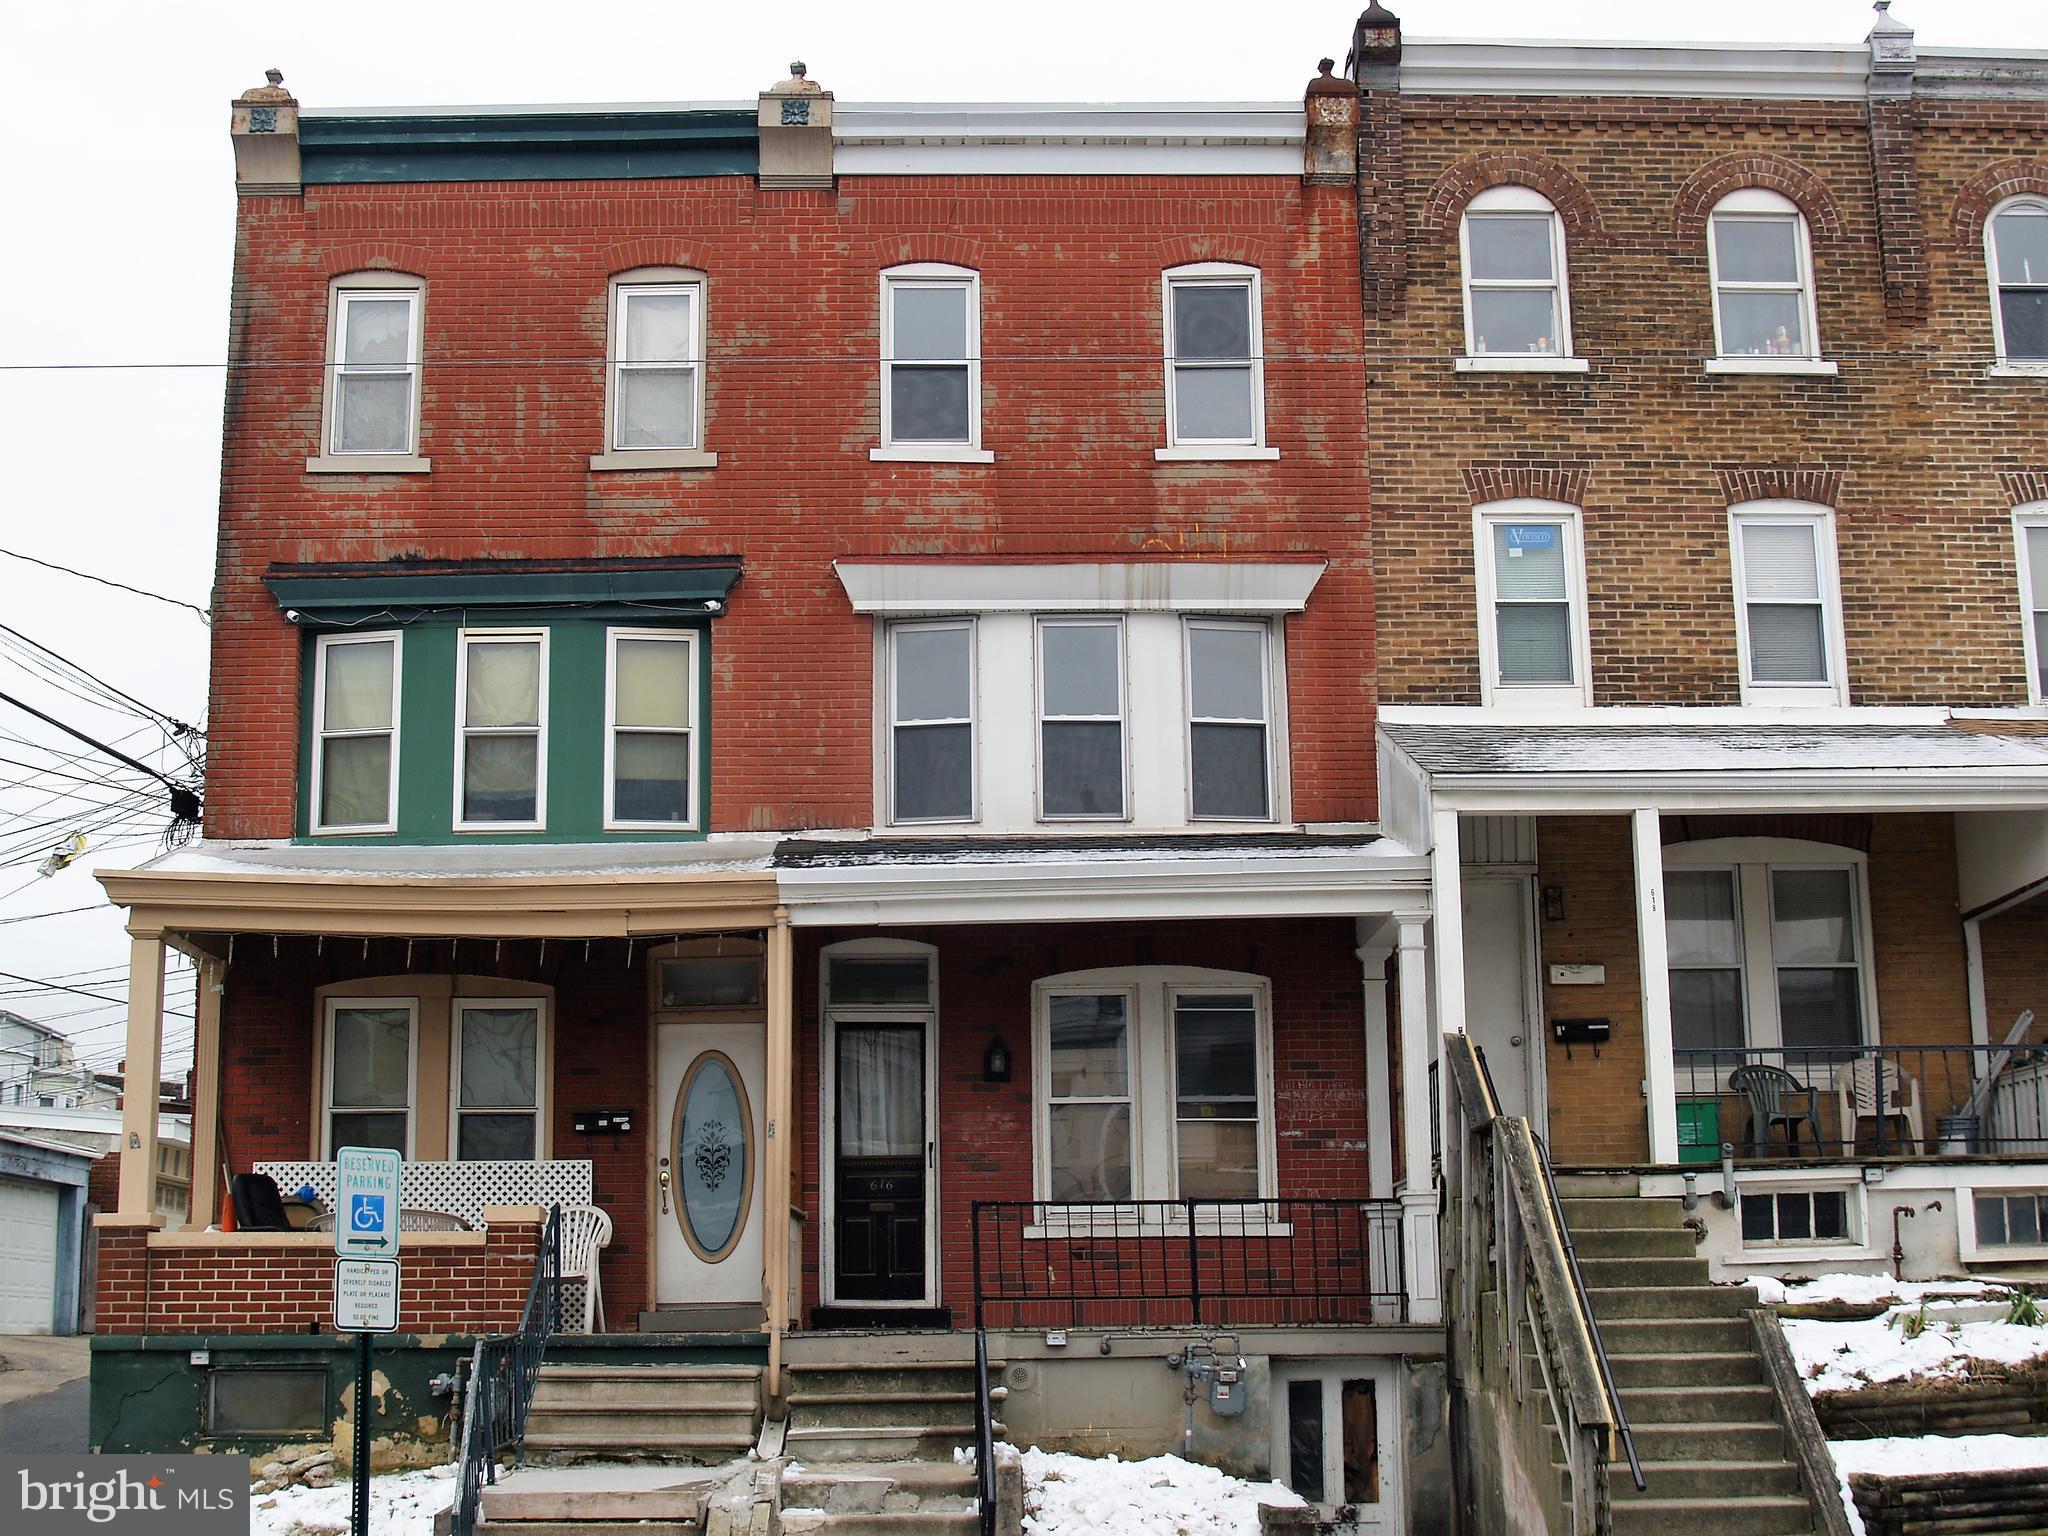 616 W GREENLEAF STREET, ALLENTOWN, PA 18102